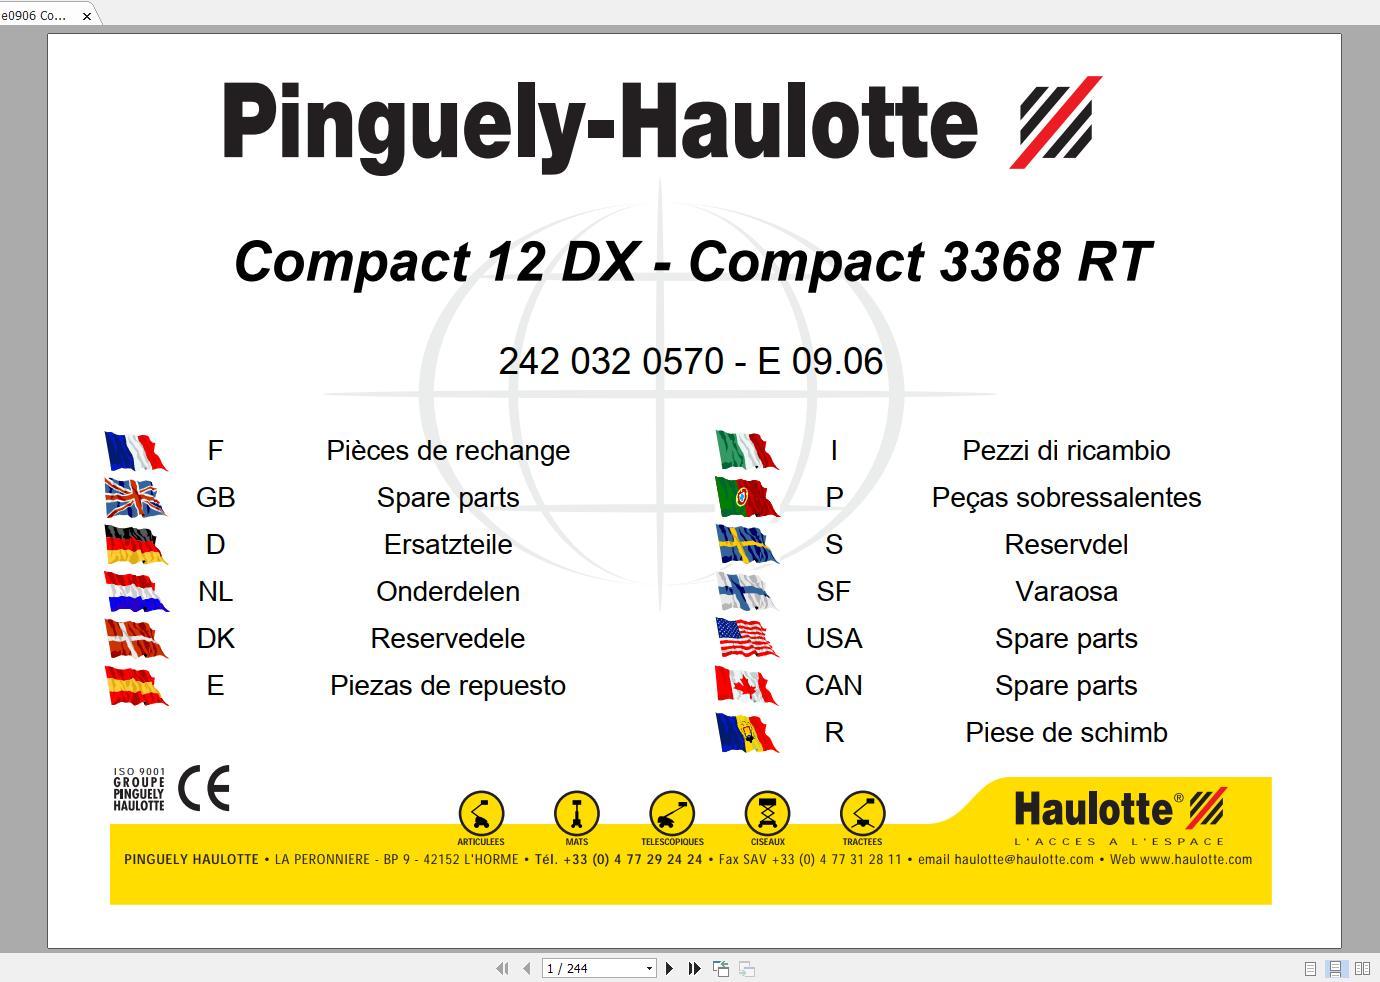 Haulotte_Work_Platforms_and_Telehandlers_Service_Maintenance_Operators_Manual_Training_Spare_Parts_Manual_DVD7